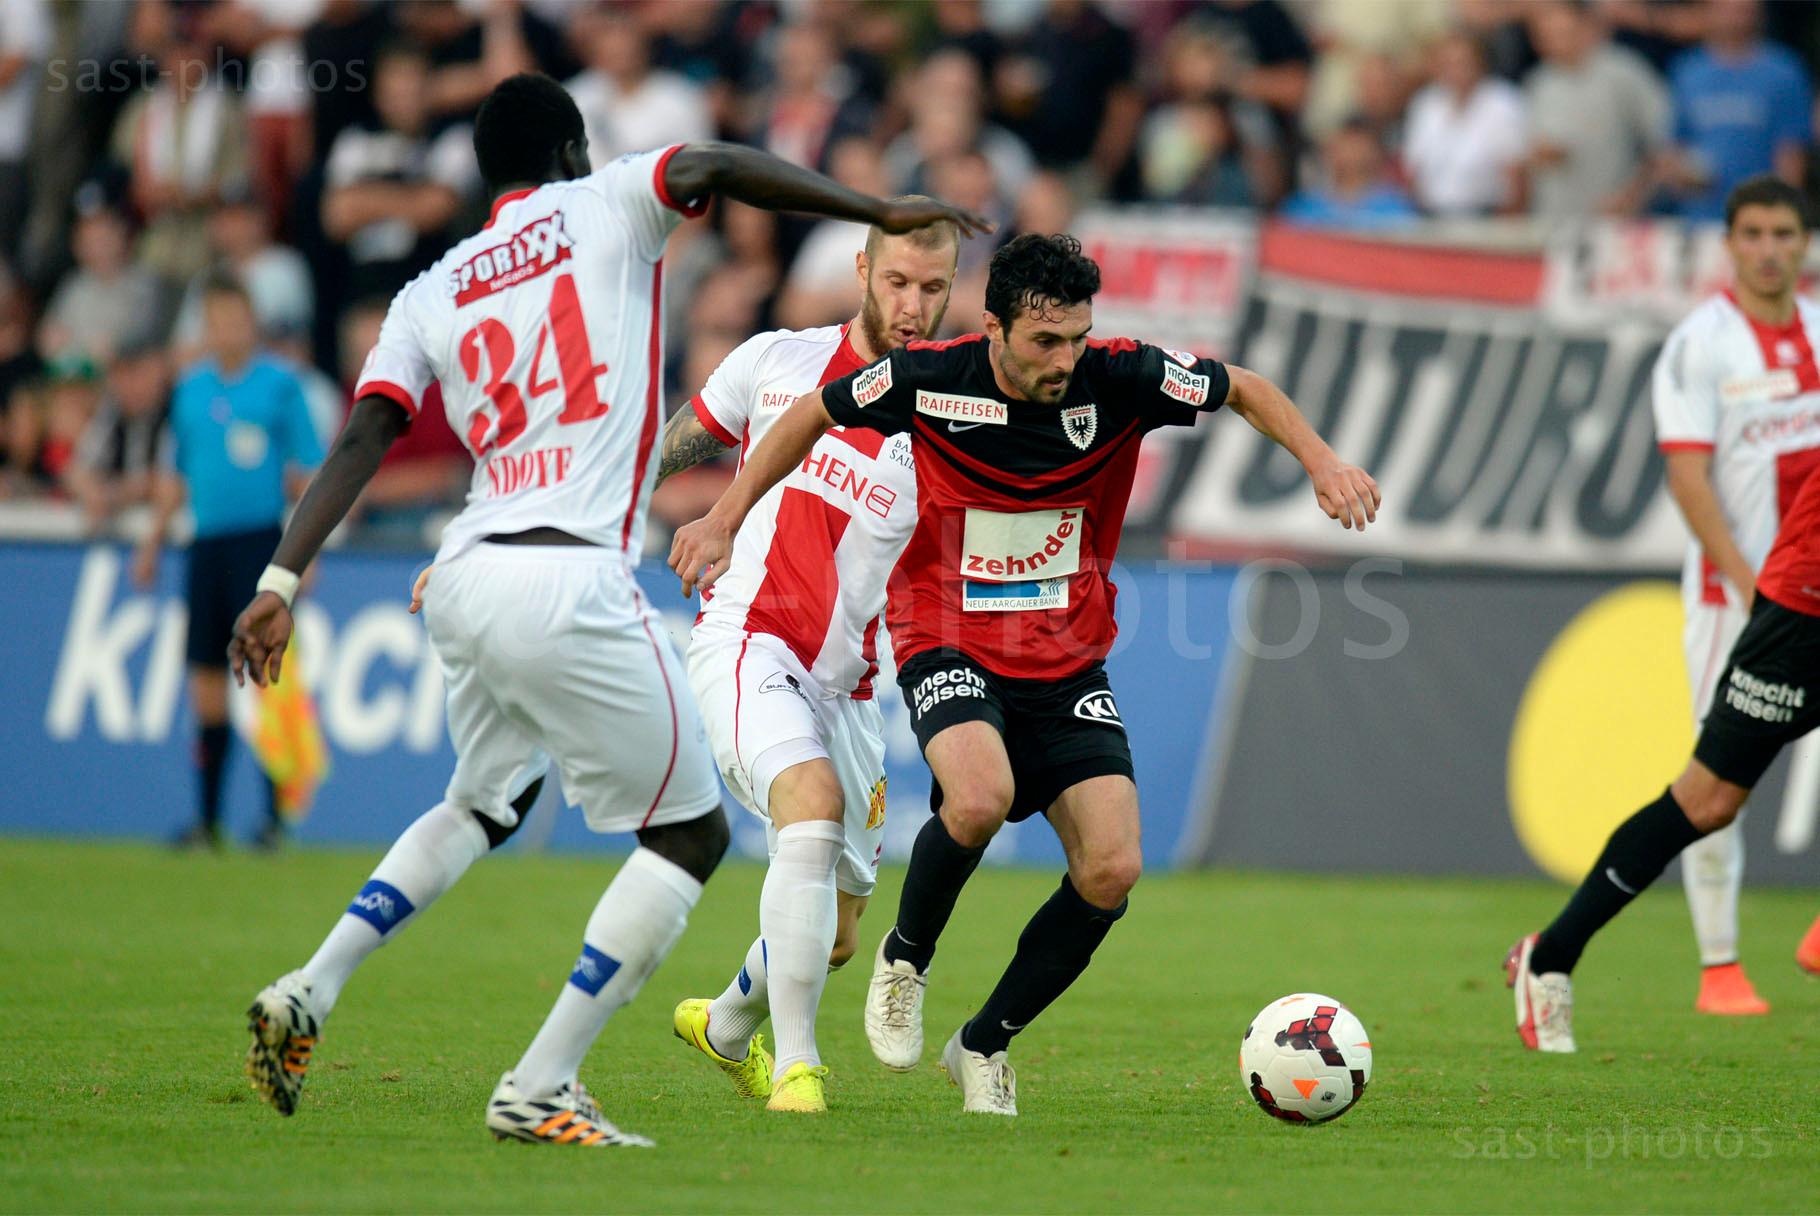 Luca Radice (Aarau) gegen Birama Ndoye (L. Sion) und Matteo Fedele (Sion)